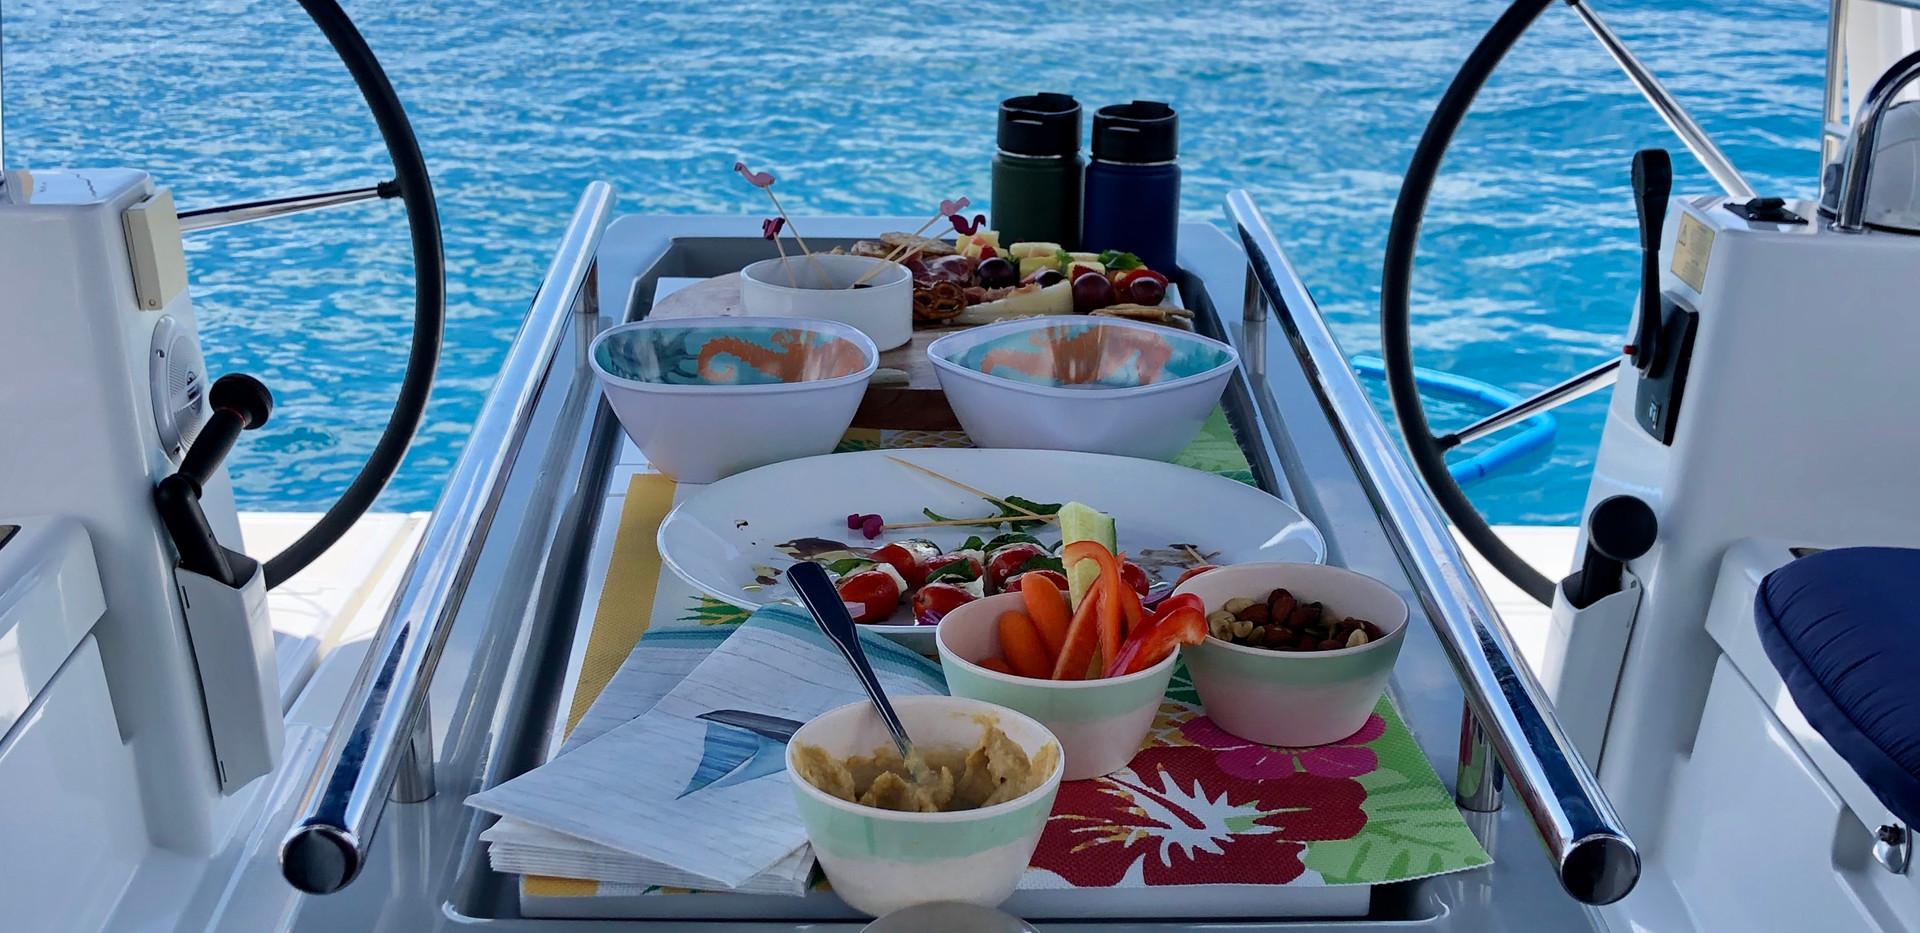 Lunch at Sailing Puerto Rico